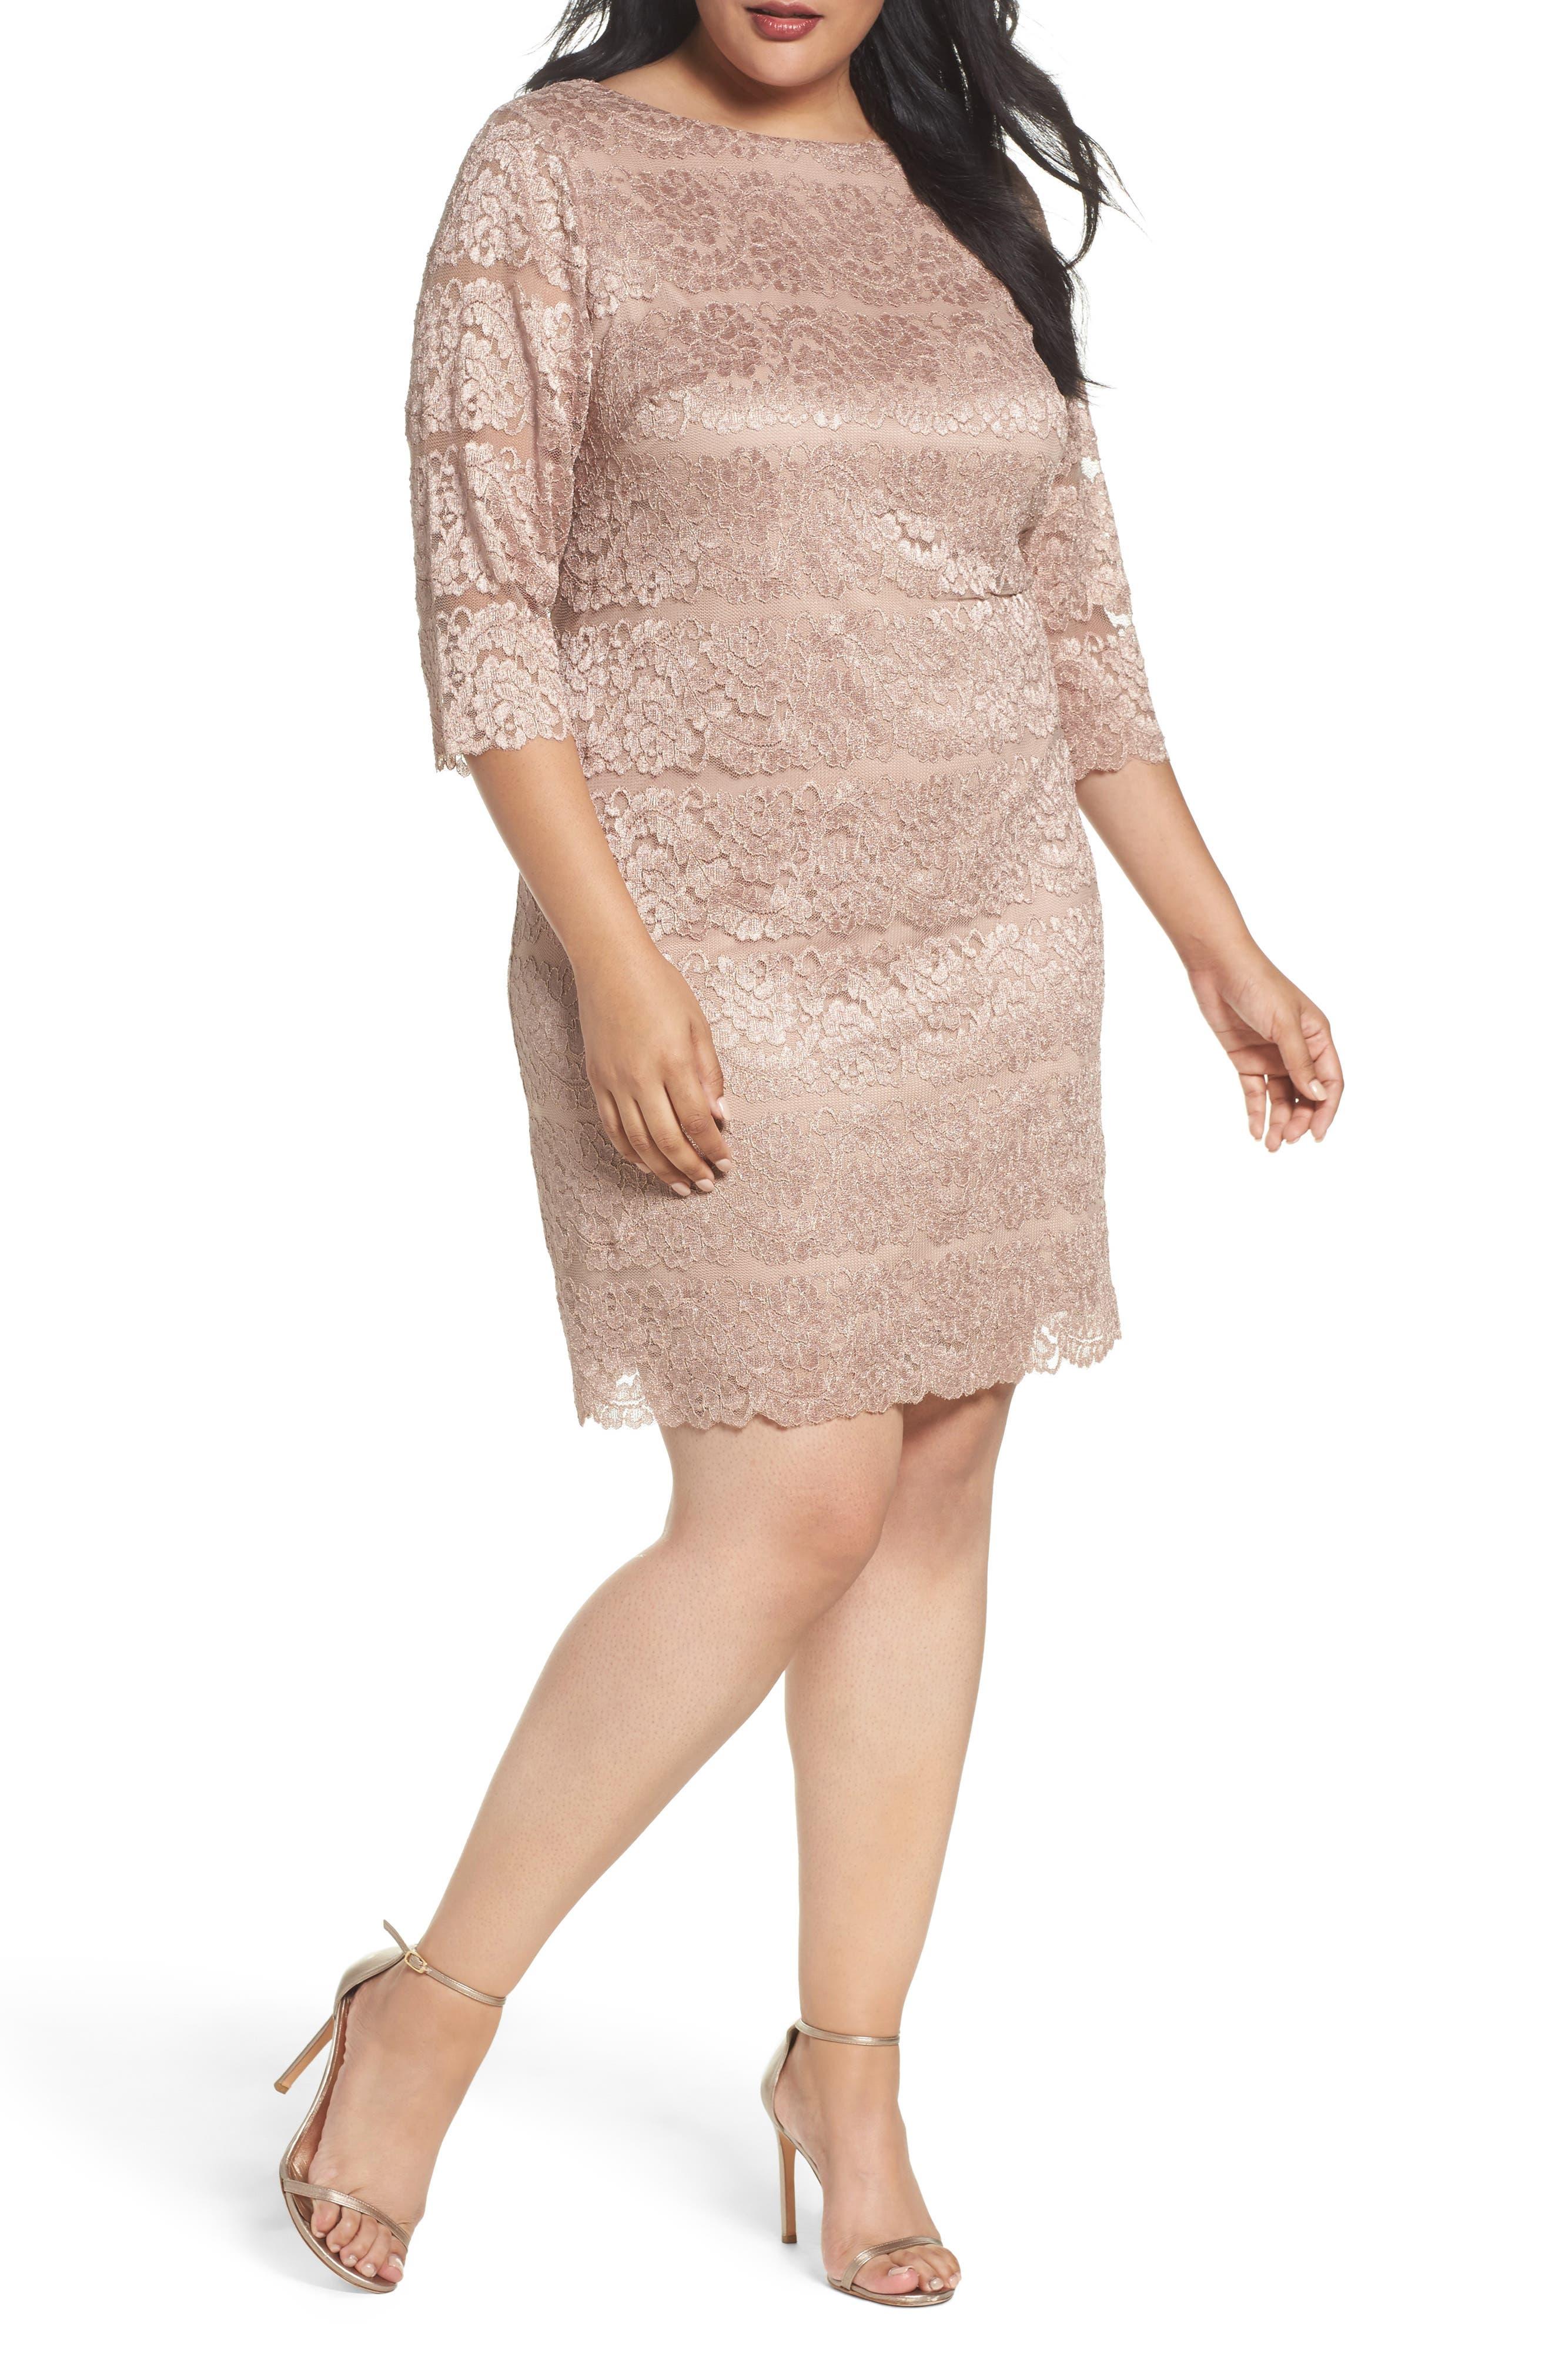 Alternate Image 1 Selected - Eliza J Lace Shift Dress (Plus Size)